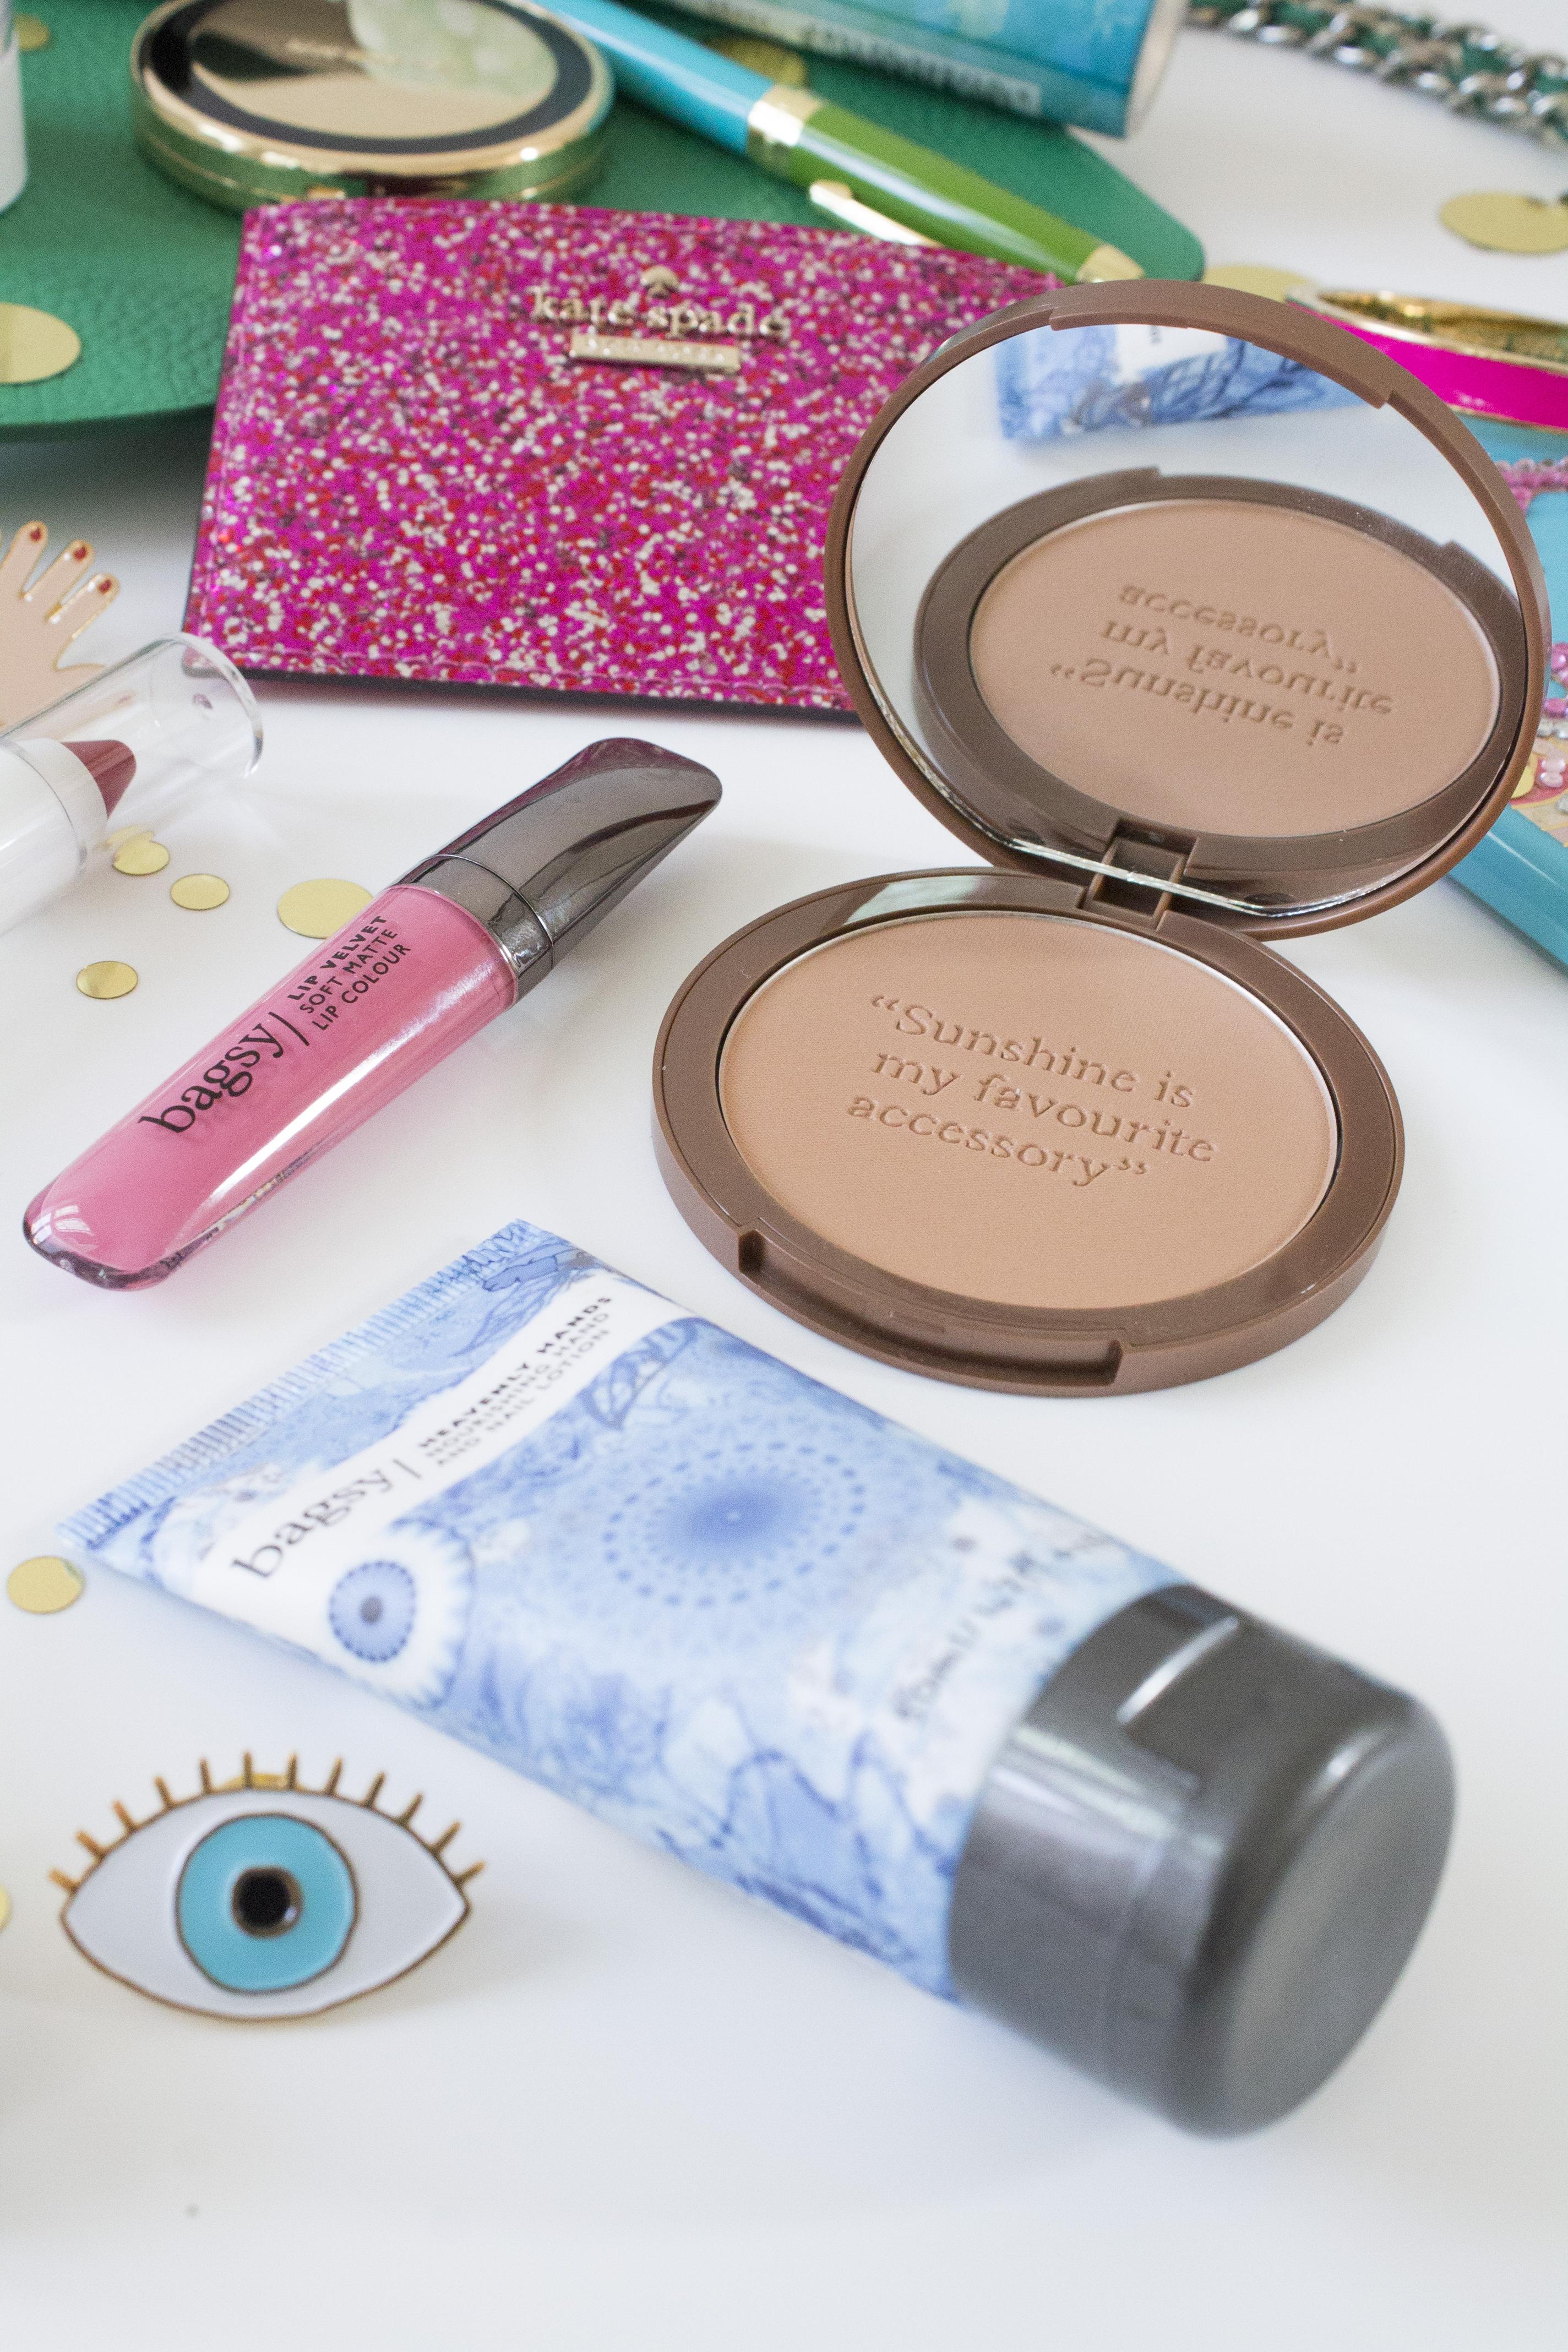 Bagsy-cosmetics-bronzer-photo-by-Geraldine-Tan